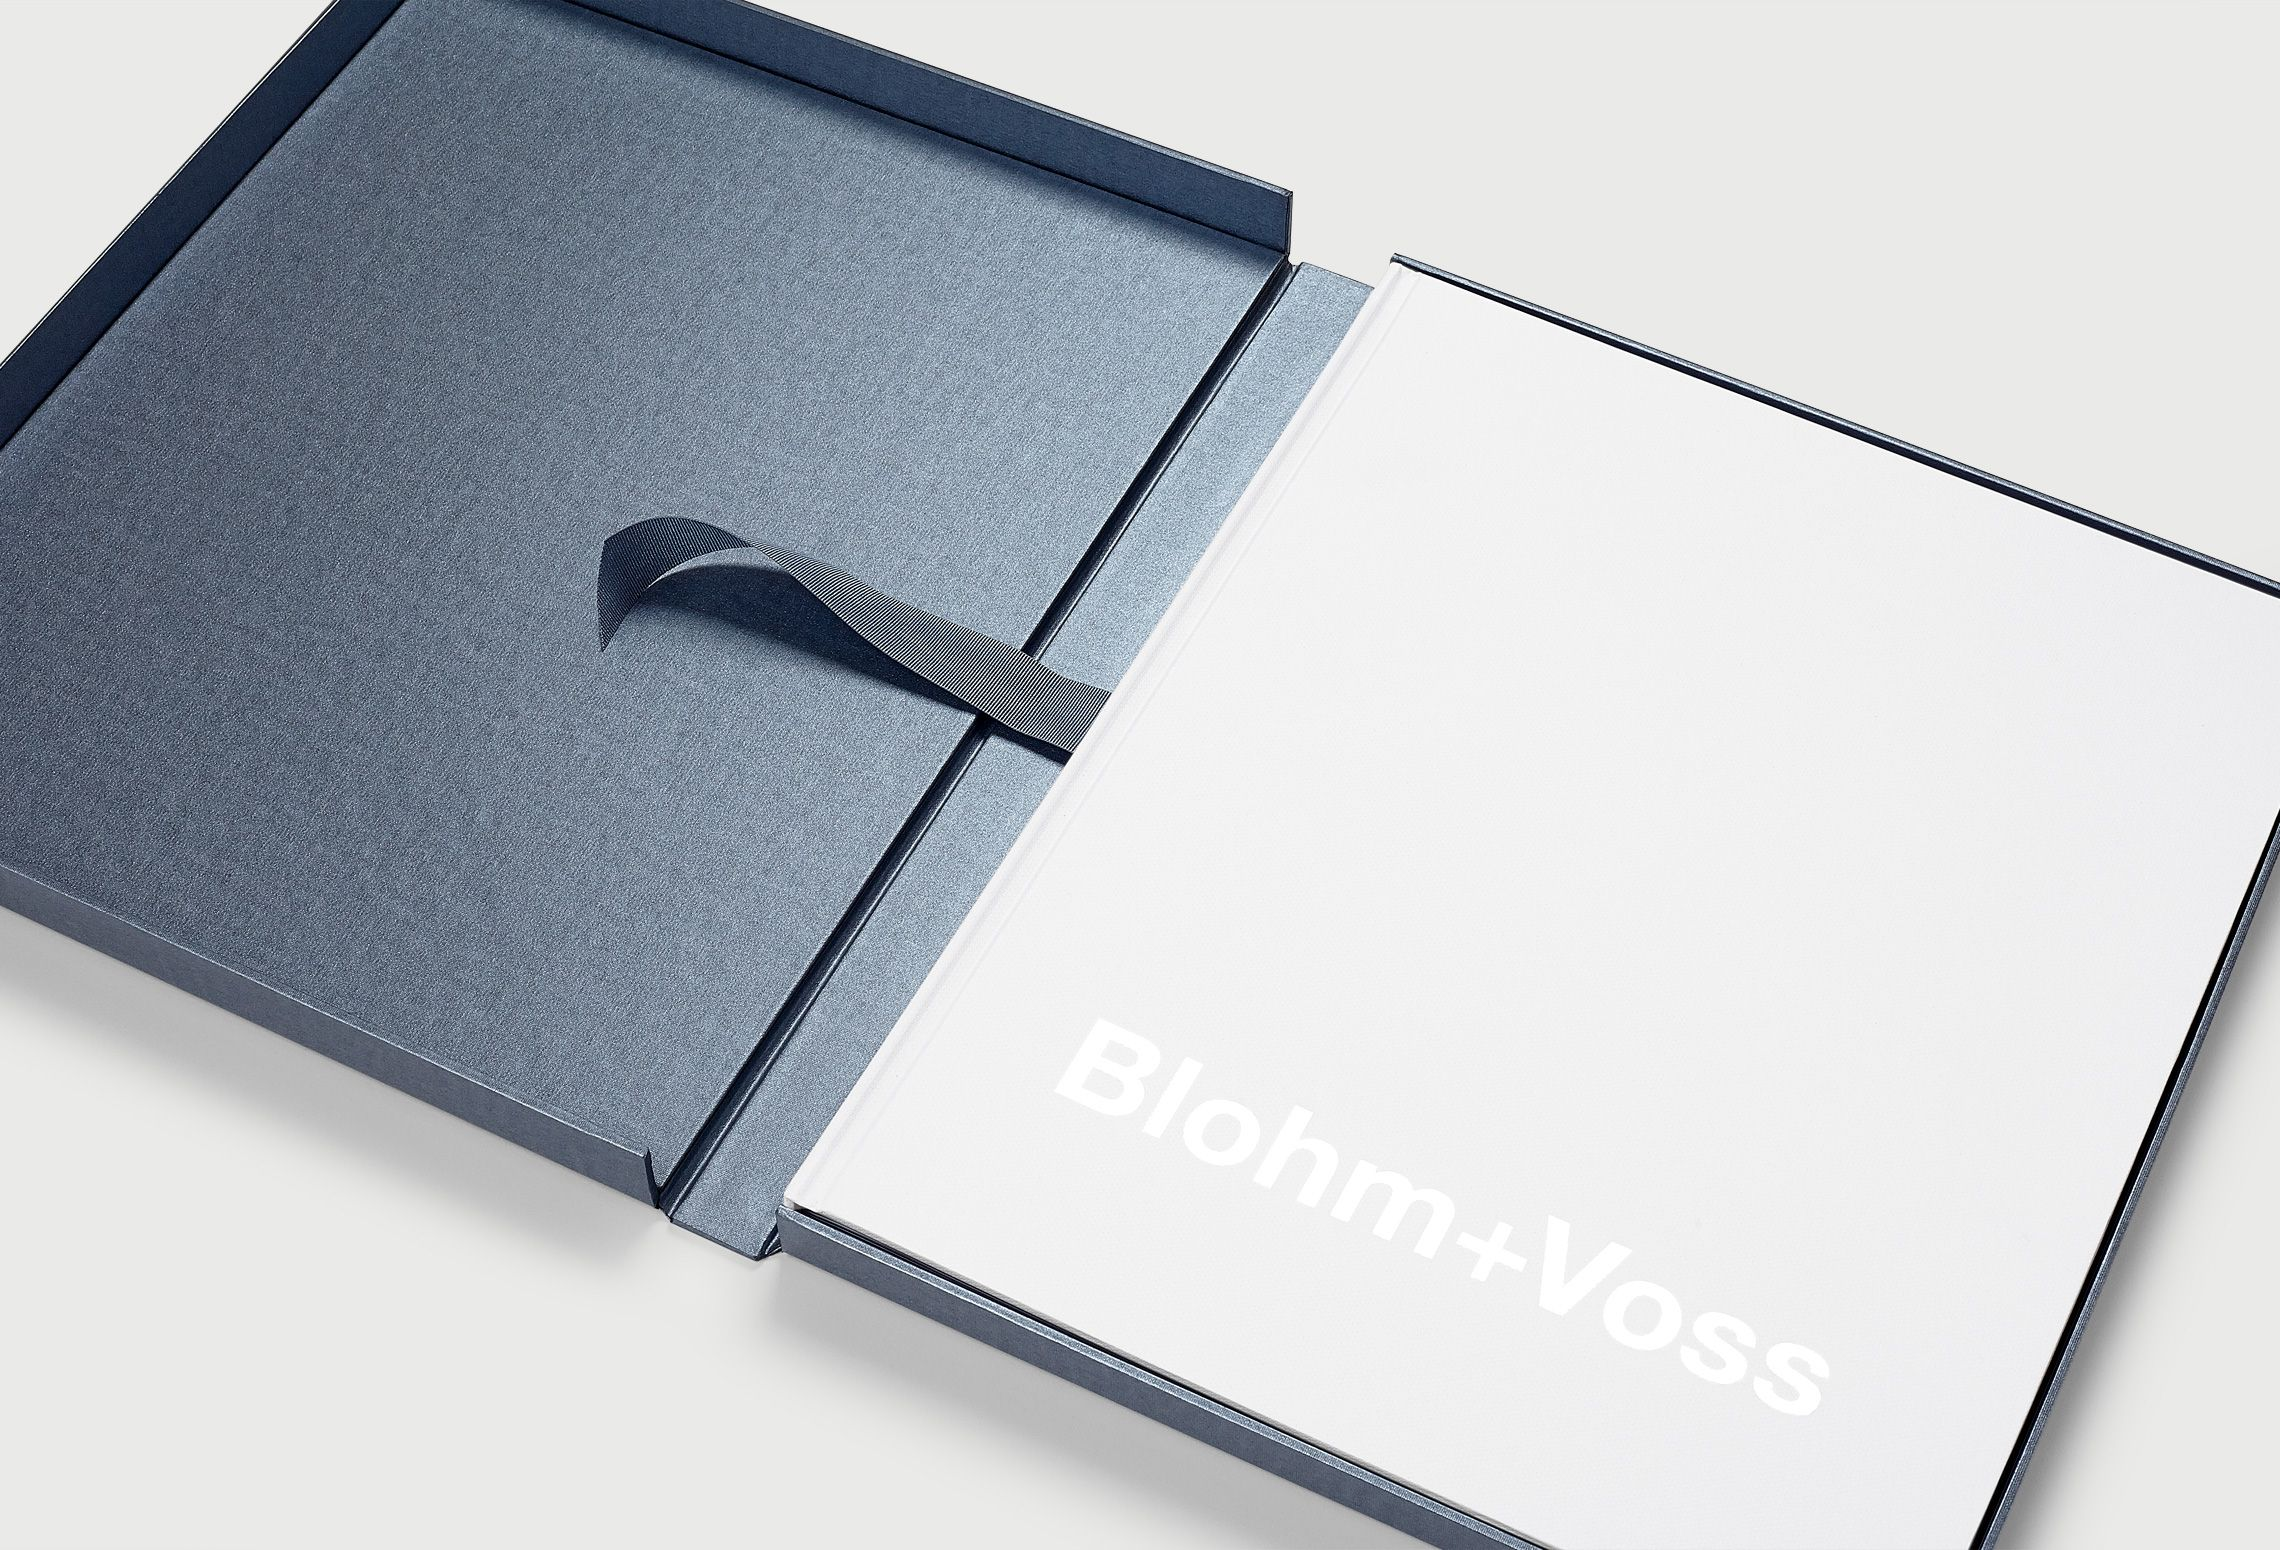 inaria luxury brand design consultants blohmvoss brand identity - Design Consultant